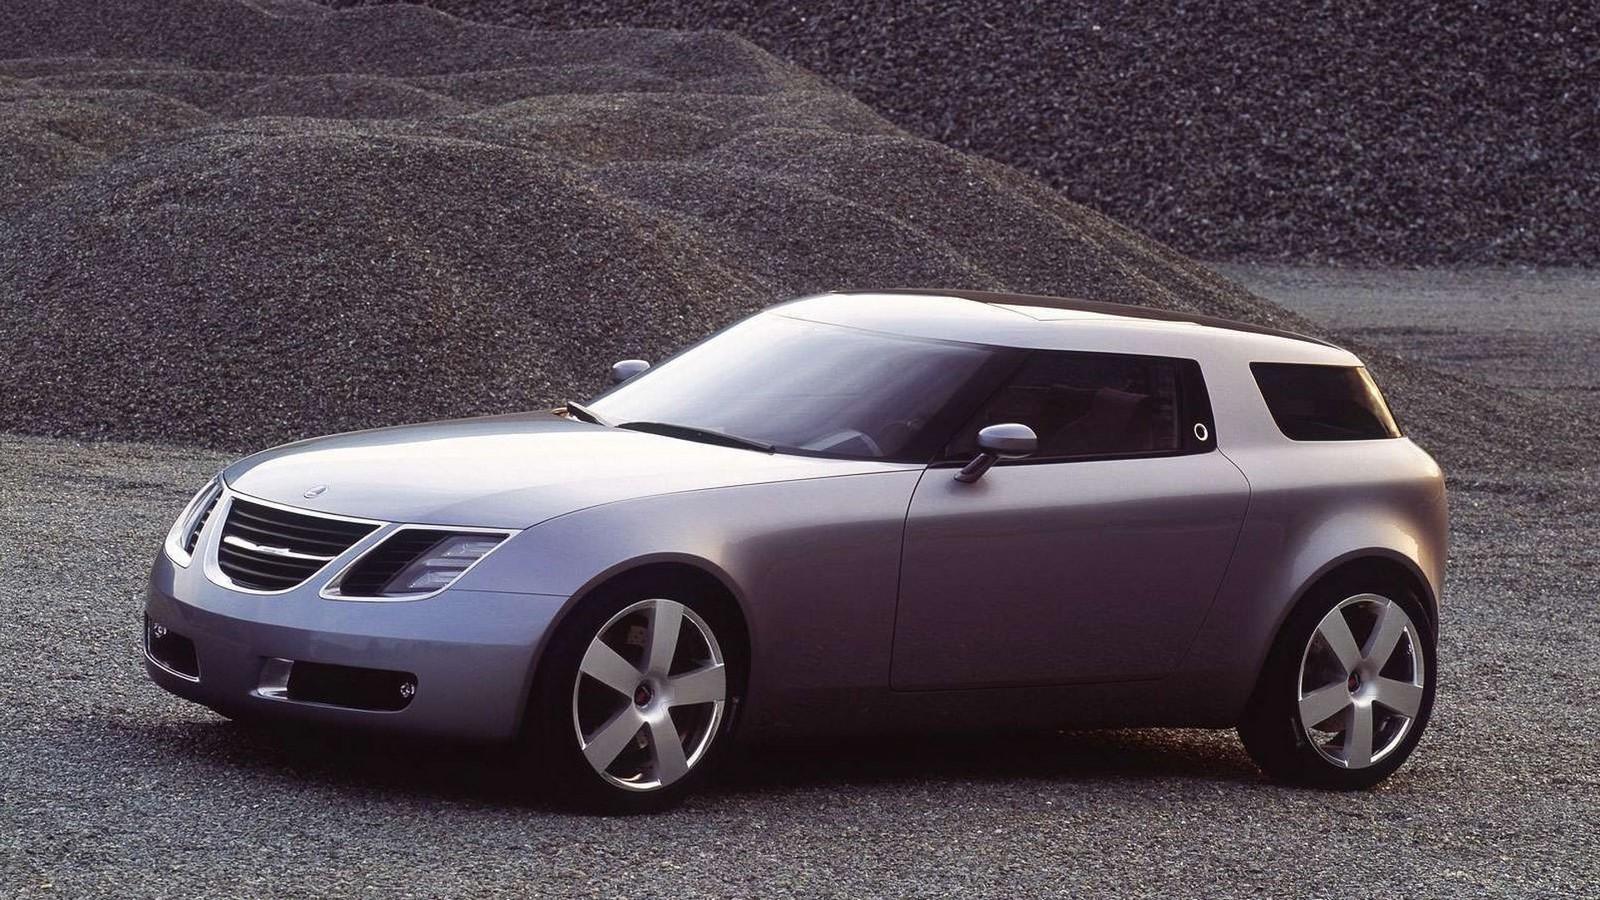 2001-saab-9x-concept (6)